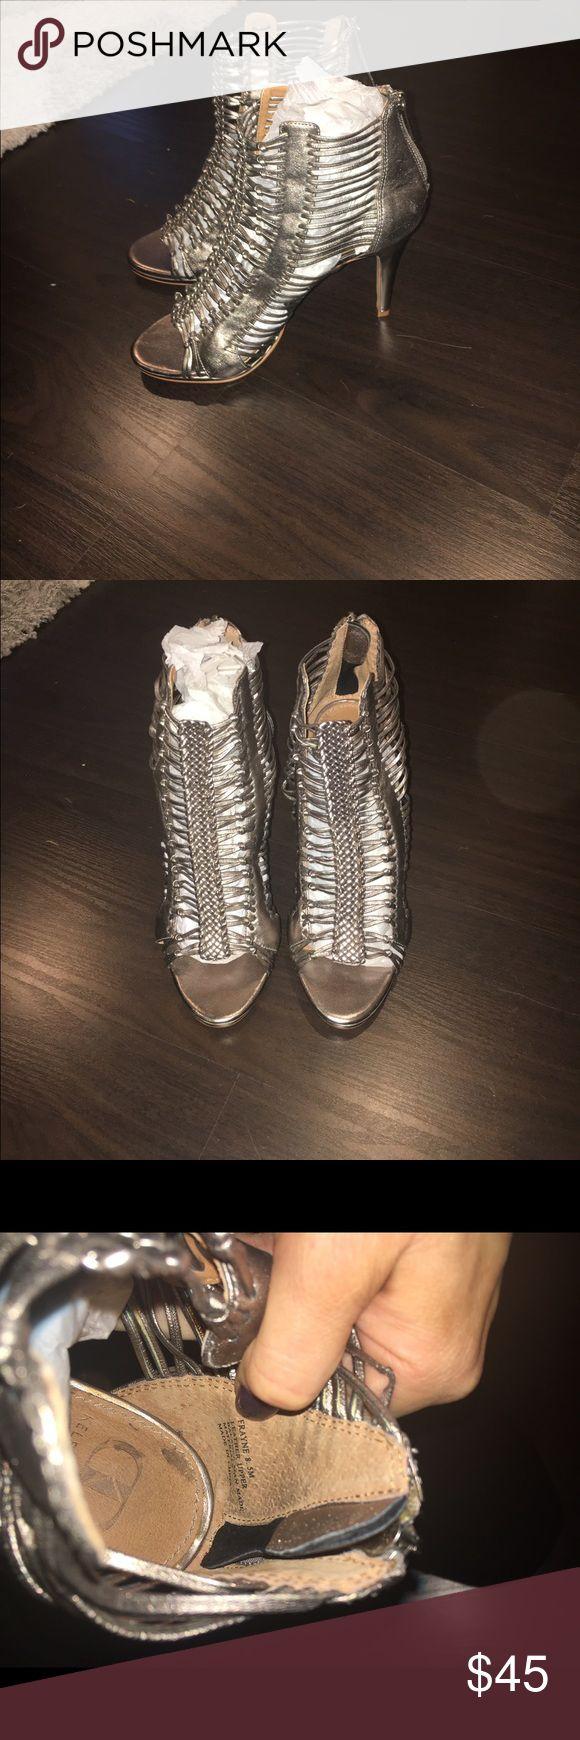 Kelsi dagger frayne caged heels Worn three times. Good condition kelsi dagger frayned heels in pewter. Size 8.5 Kelsi Dagger Shoes Heels